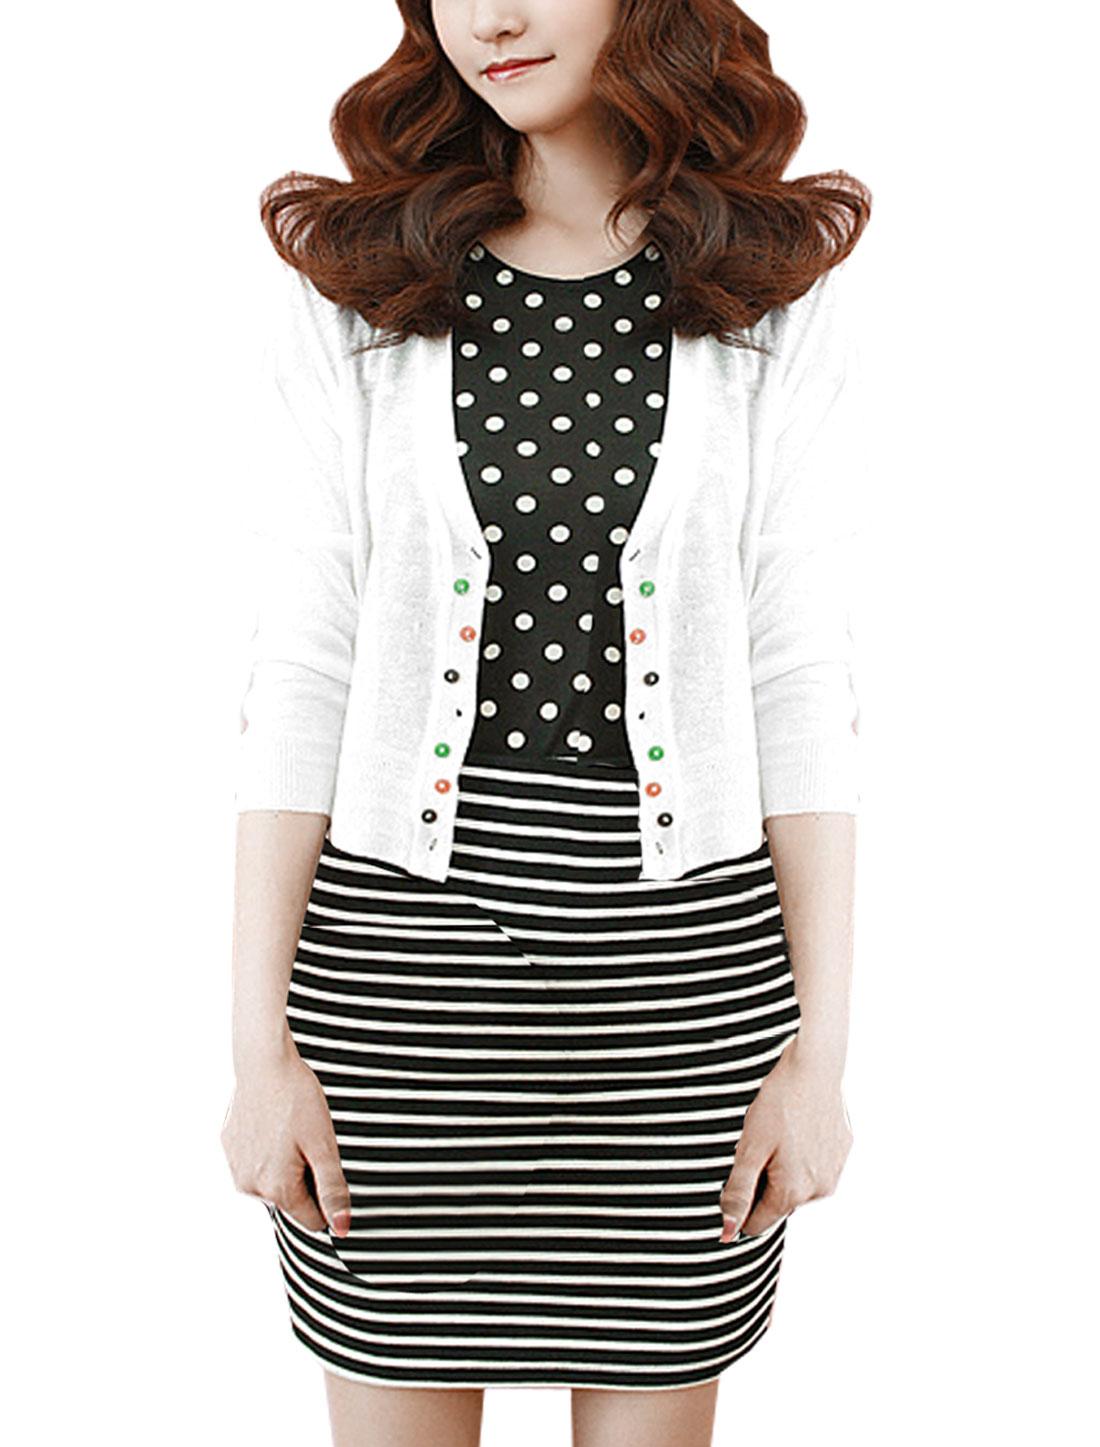 Women Stylish Colorful Button Decor White Mesh Bolero Shrug L